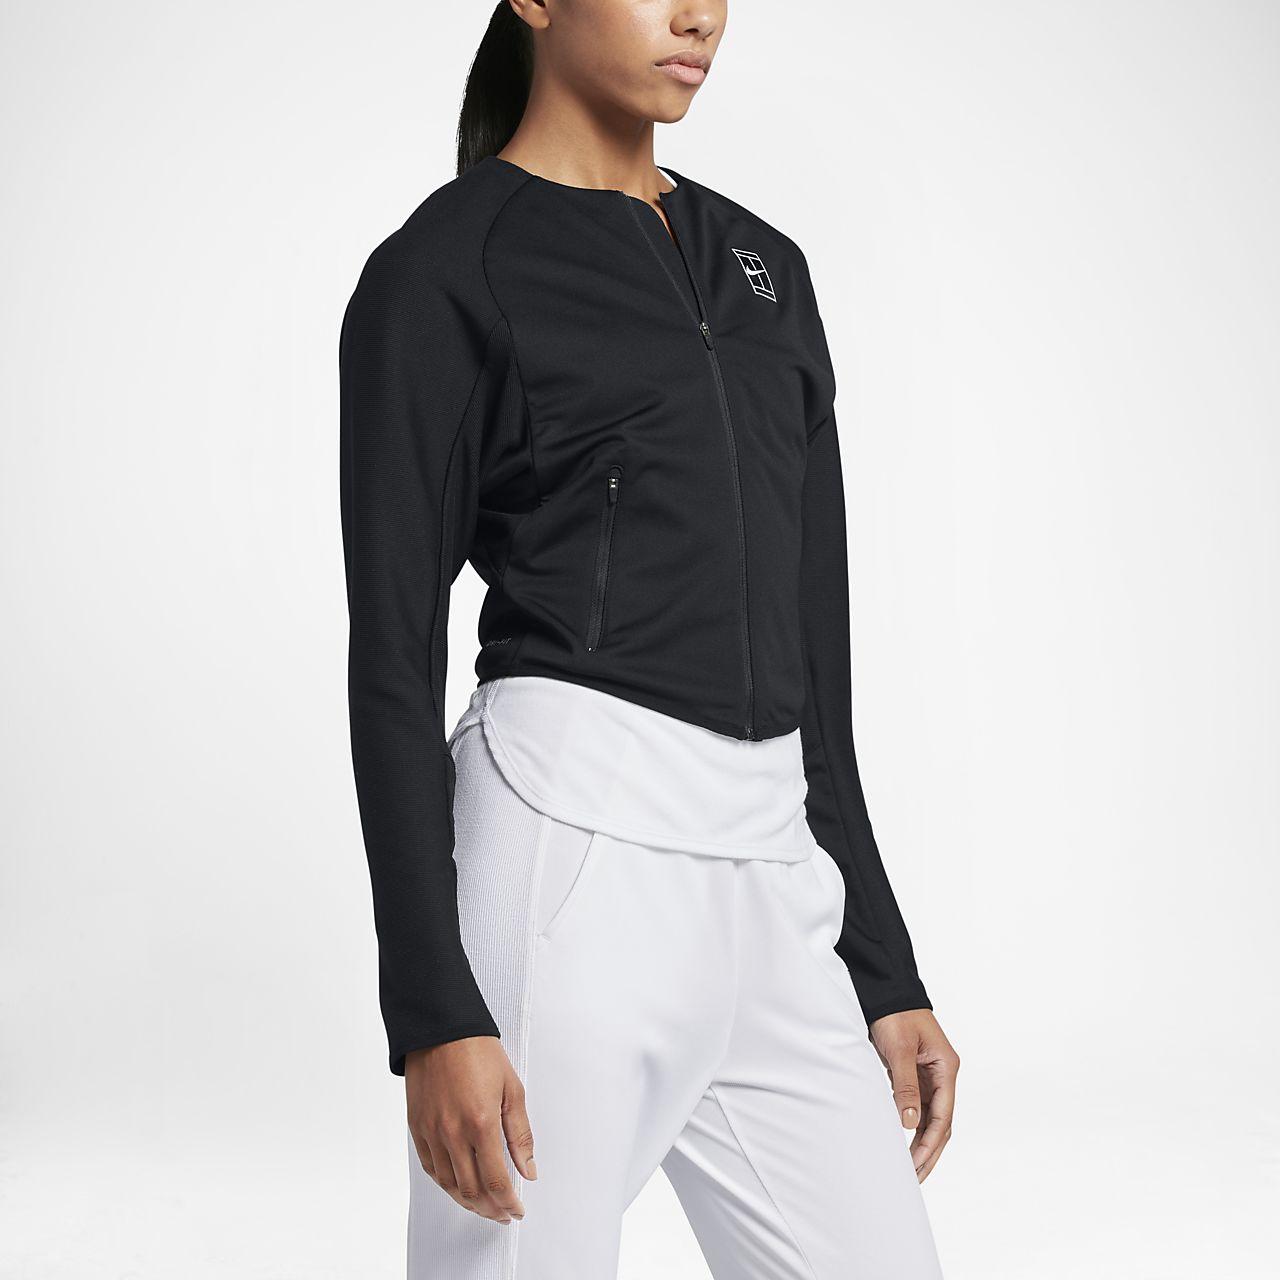 NikeCourt Women's Knit Tennis Jackets White/Black